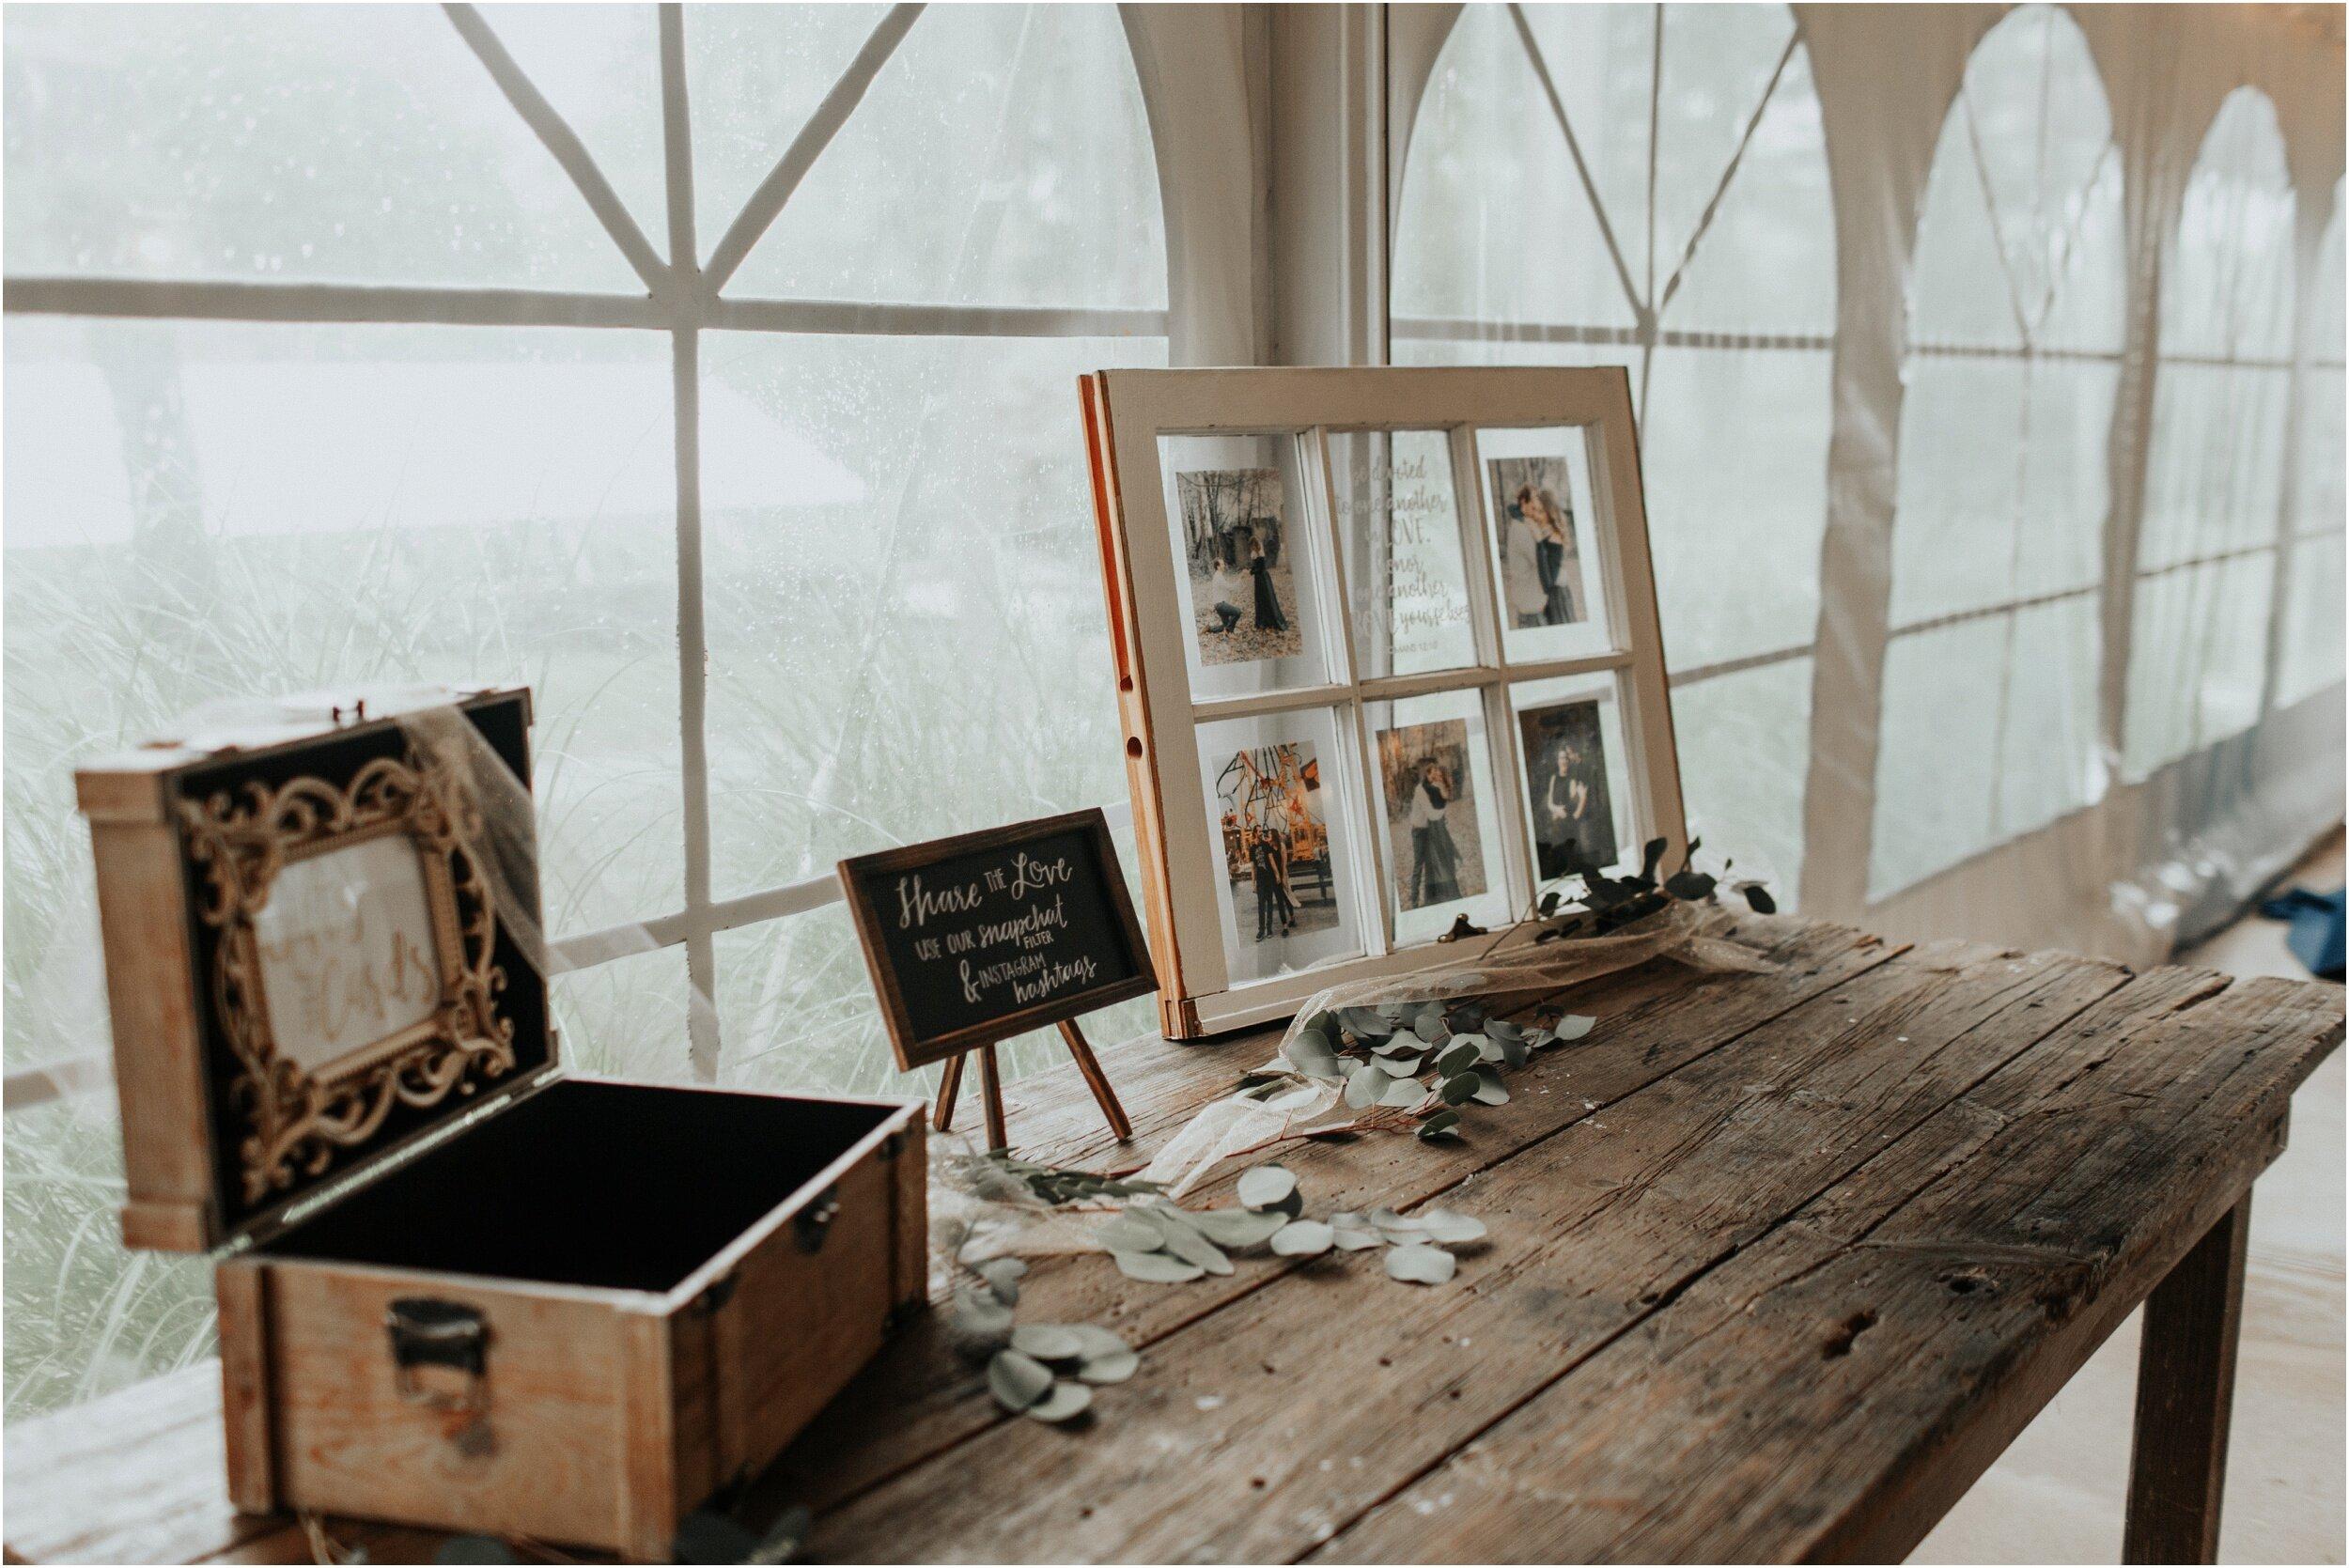 steph-and-jordan-cox-our-wedding-historic-shady-lane-compass-wedding-collective-hazel-lining-photography-destination-elopement-wedding-engagement-photography_0077.jpg